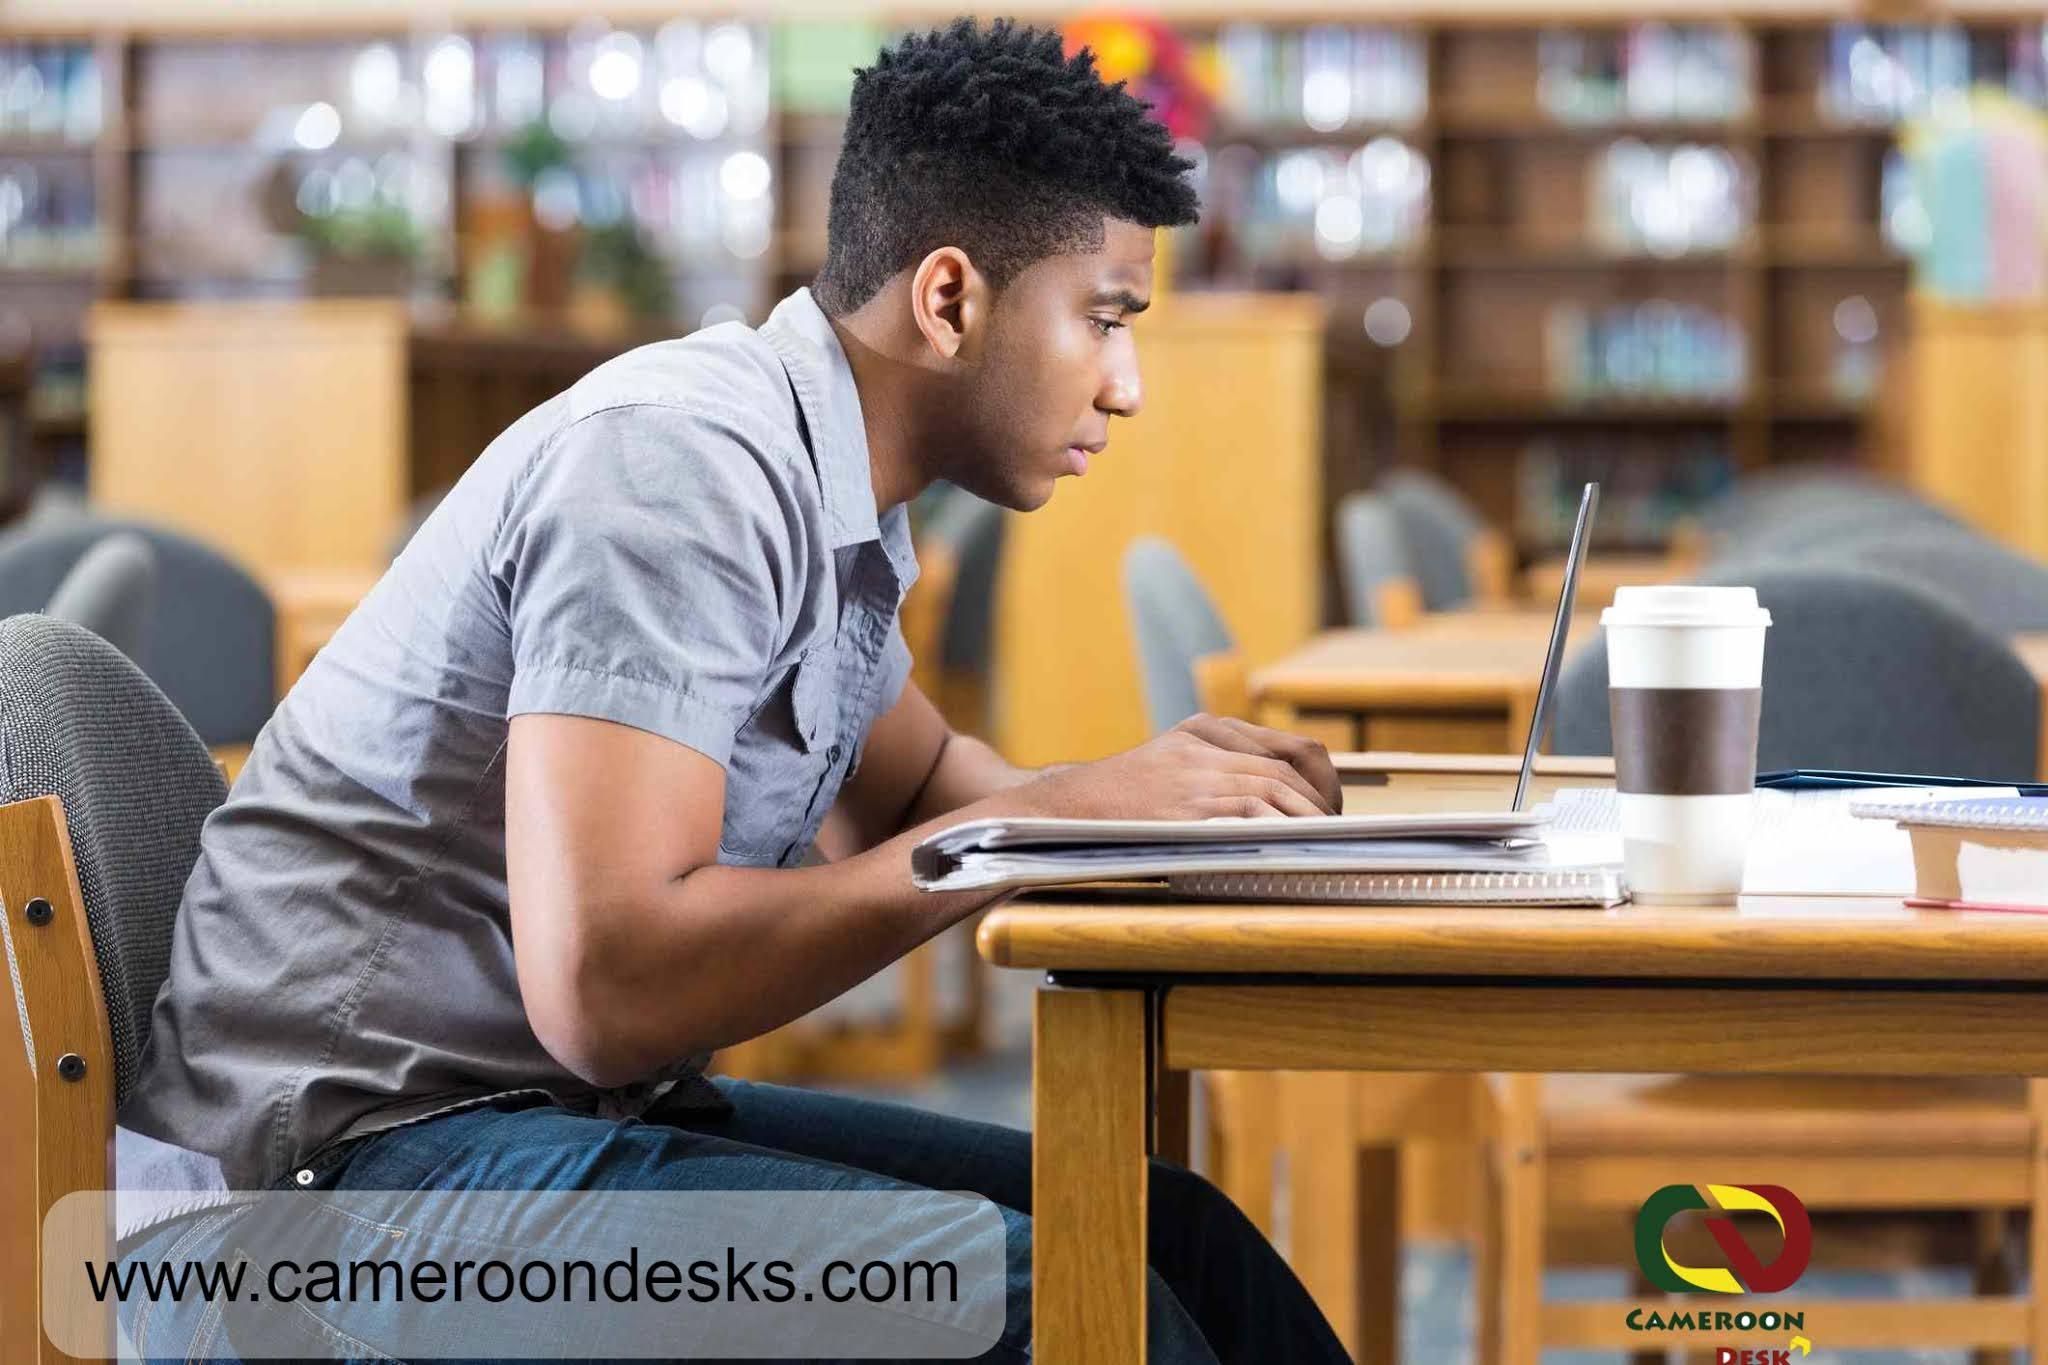 Mastercard University of Edinburgh Online Masters Scholarships 2021